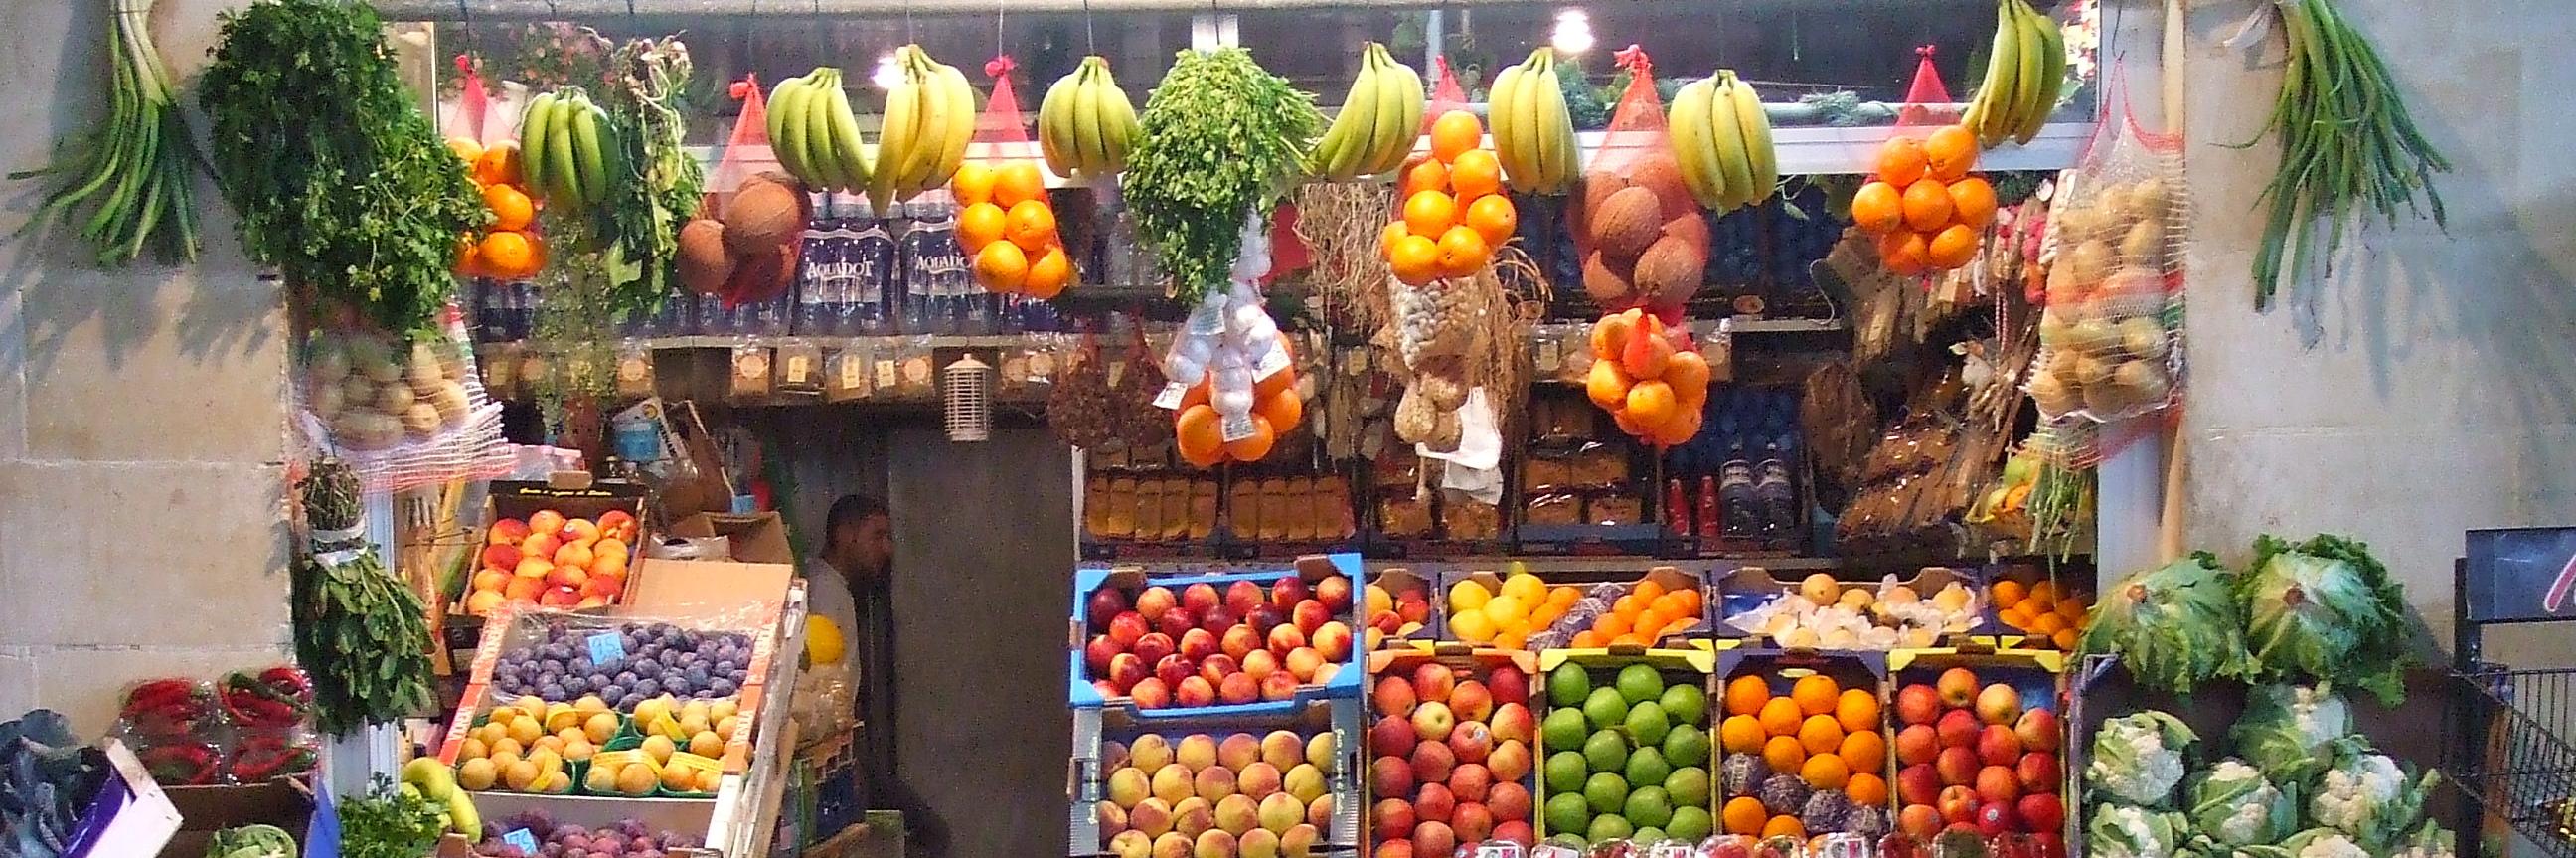 L'étal de fruits et légumes